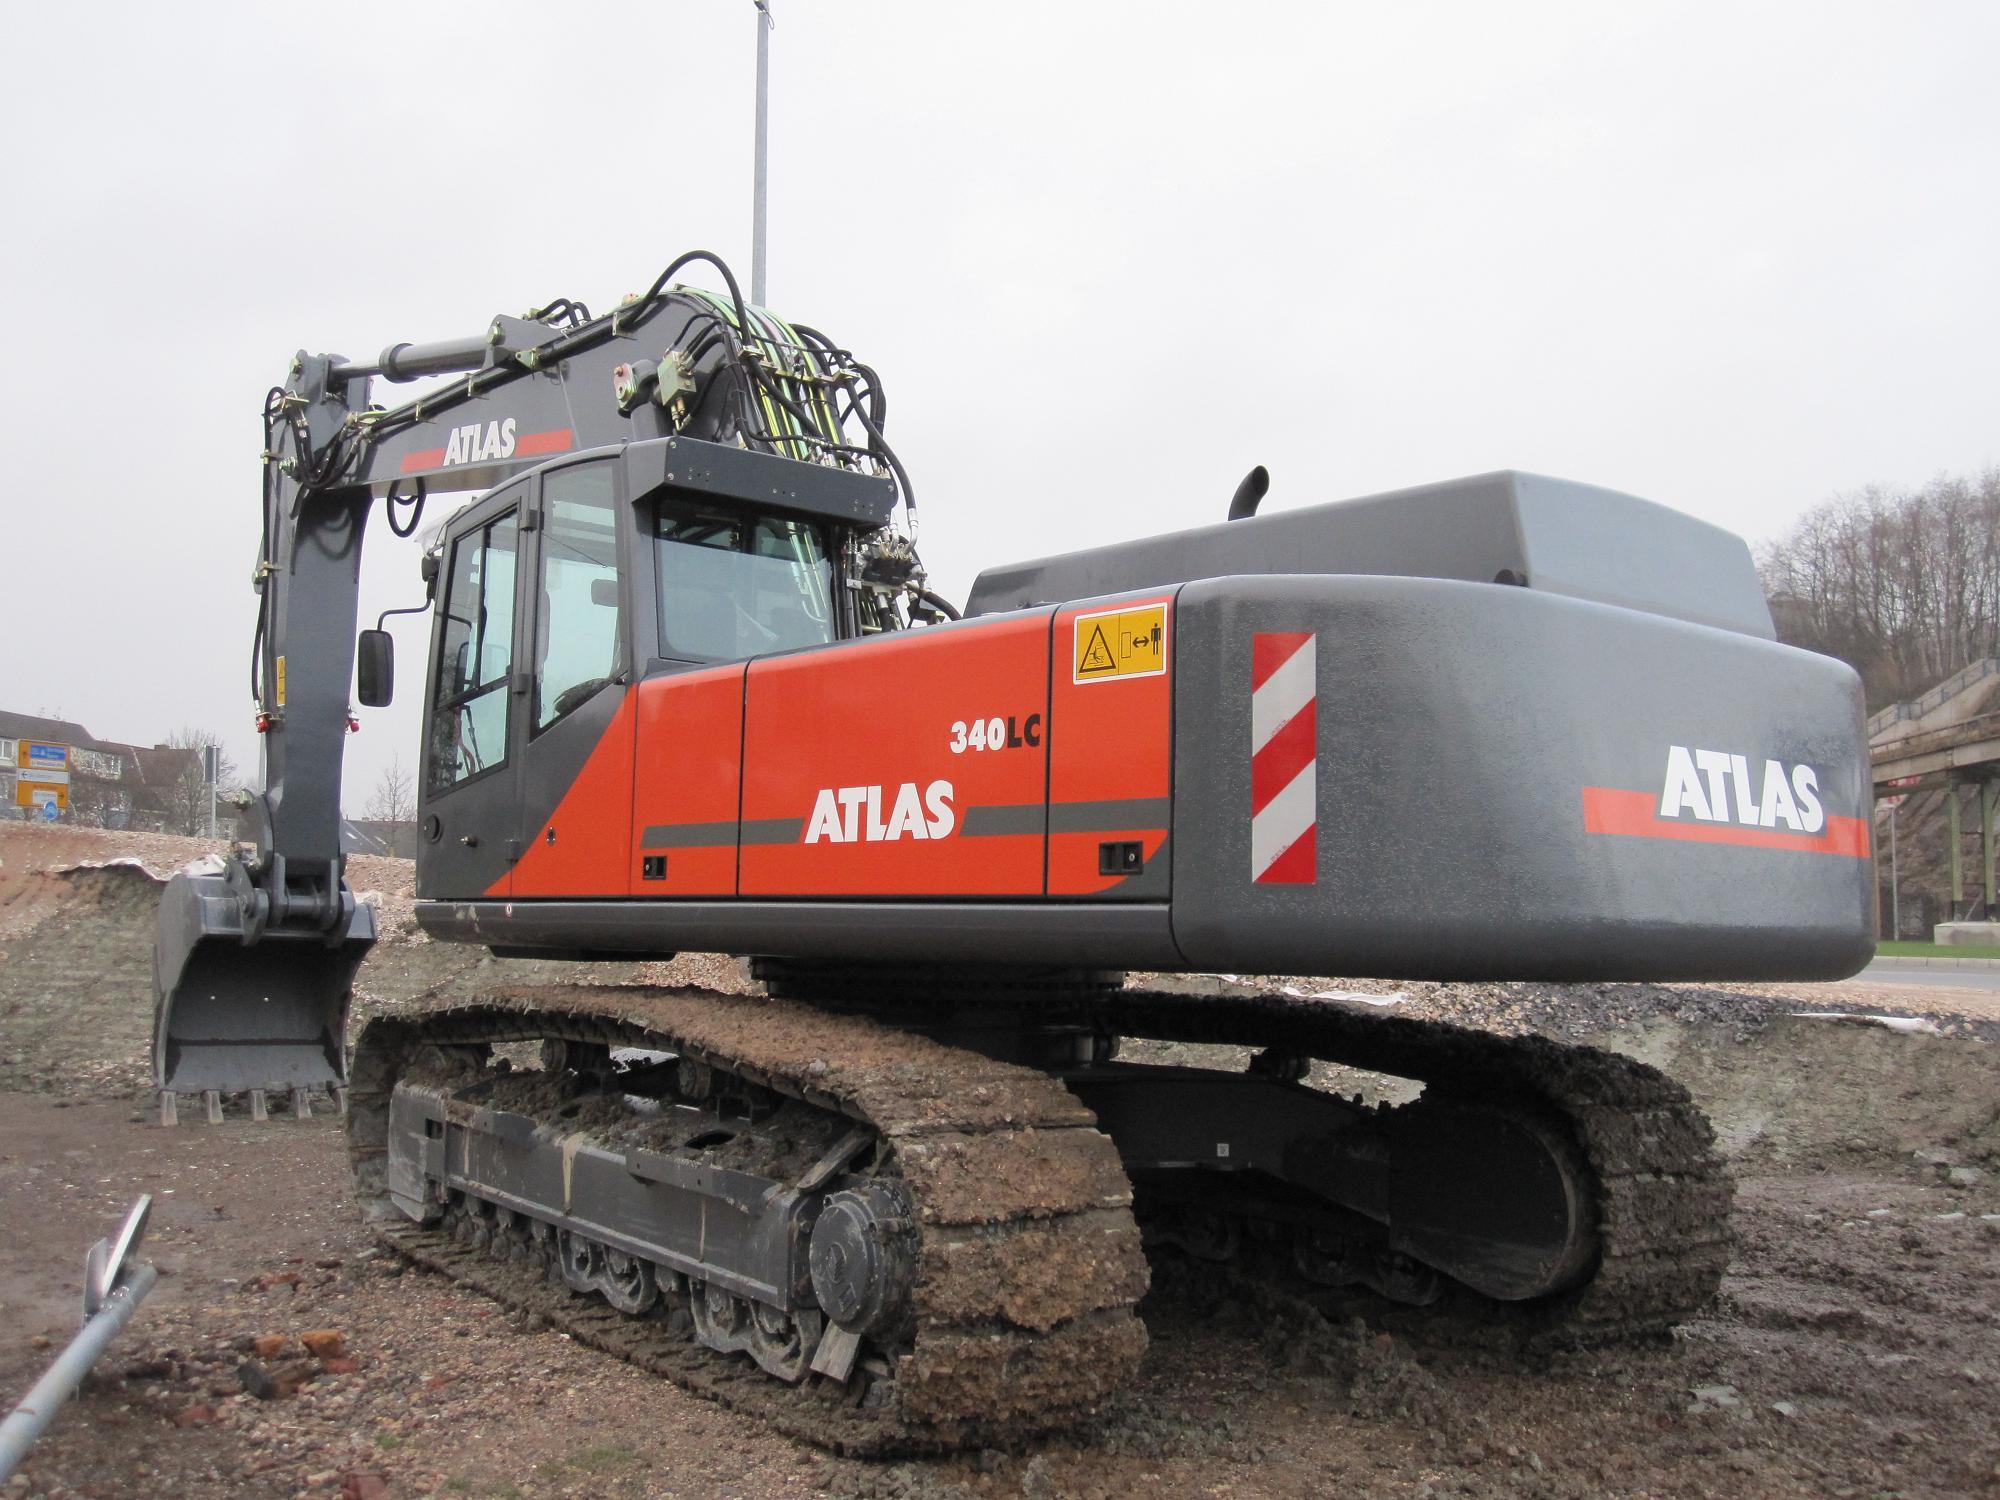 ATLAS 340 LC